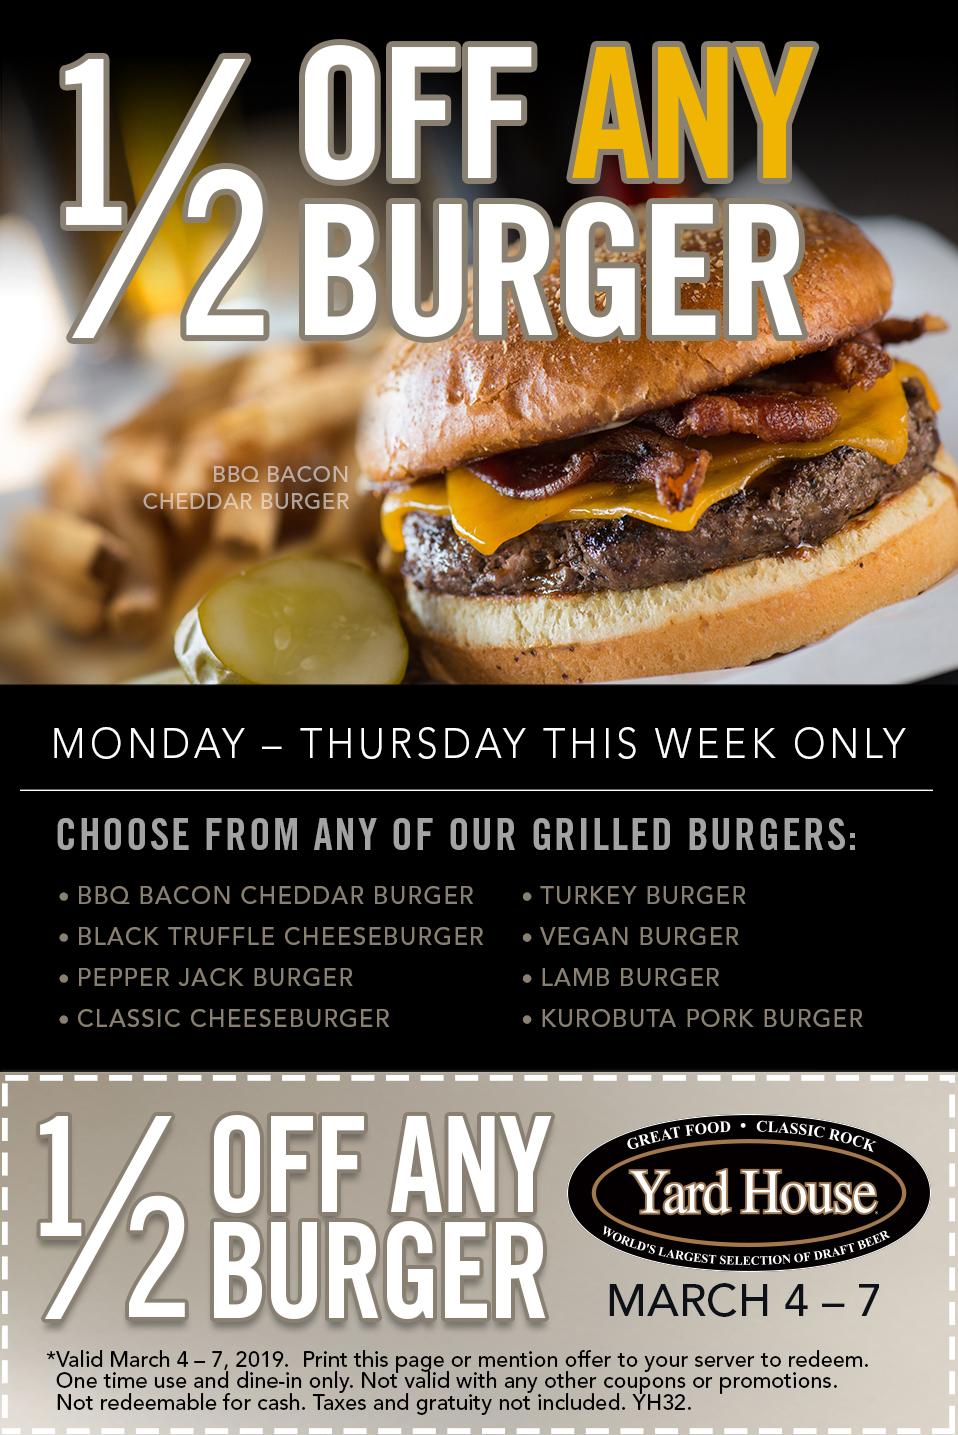 The Yard House Restaurants - Half Off Any Burger through Thurs., March 7, 2019 $7